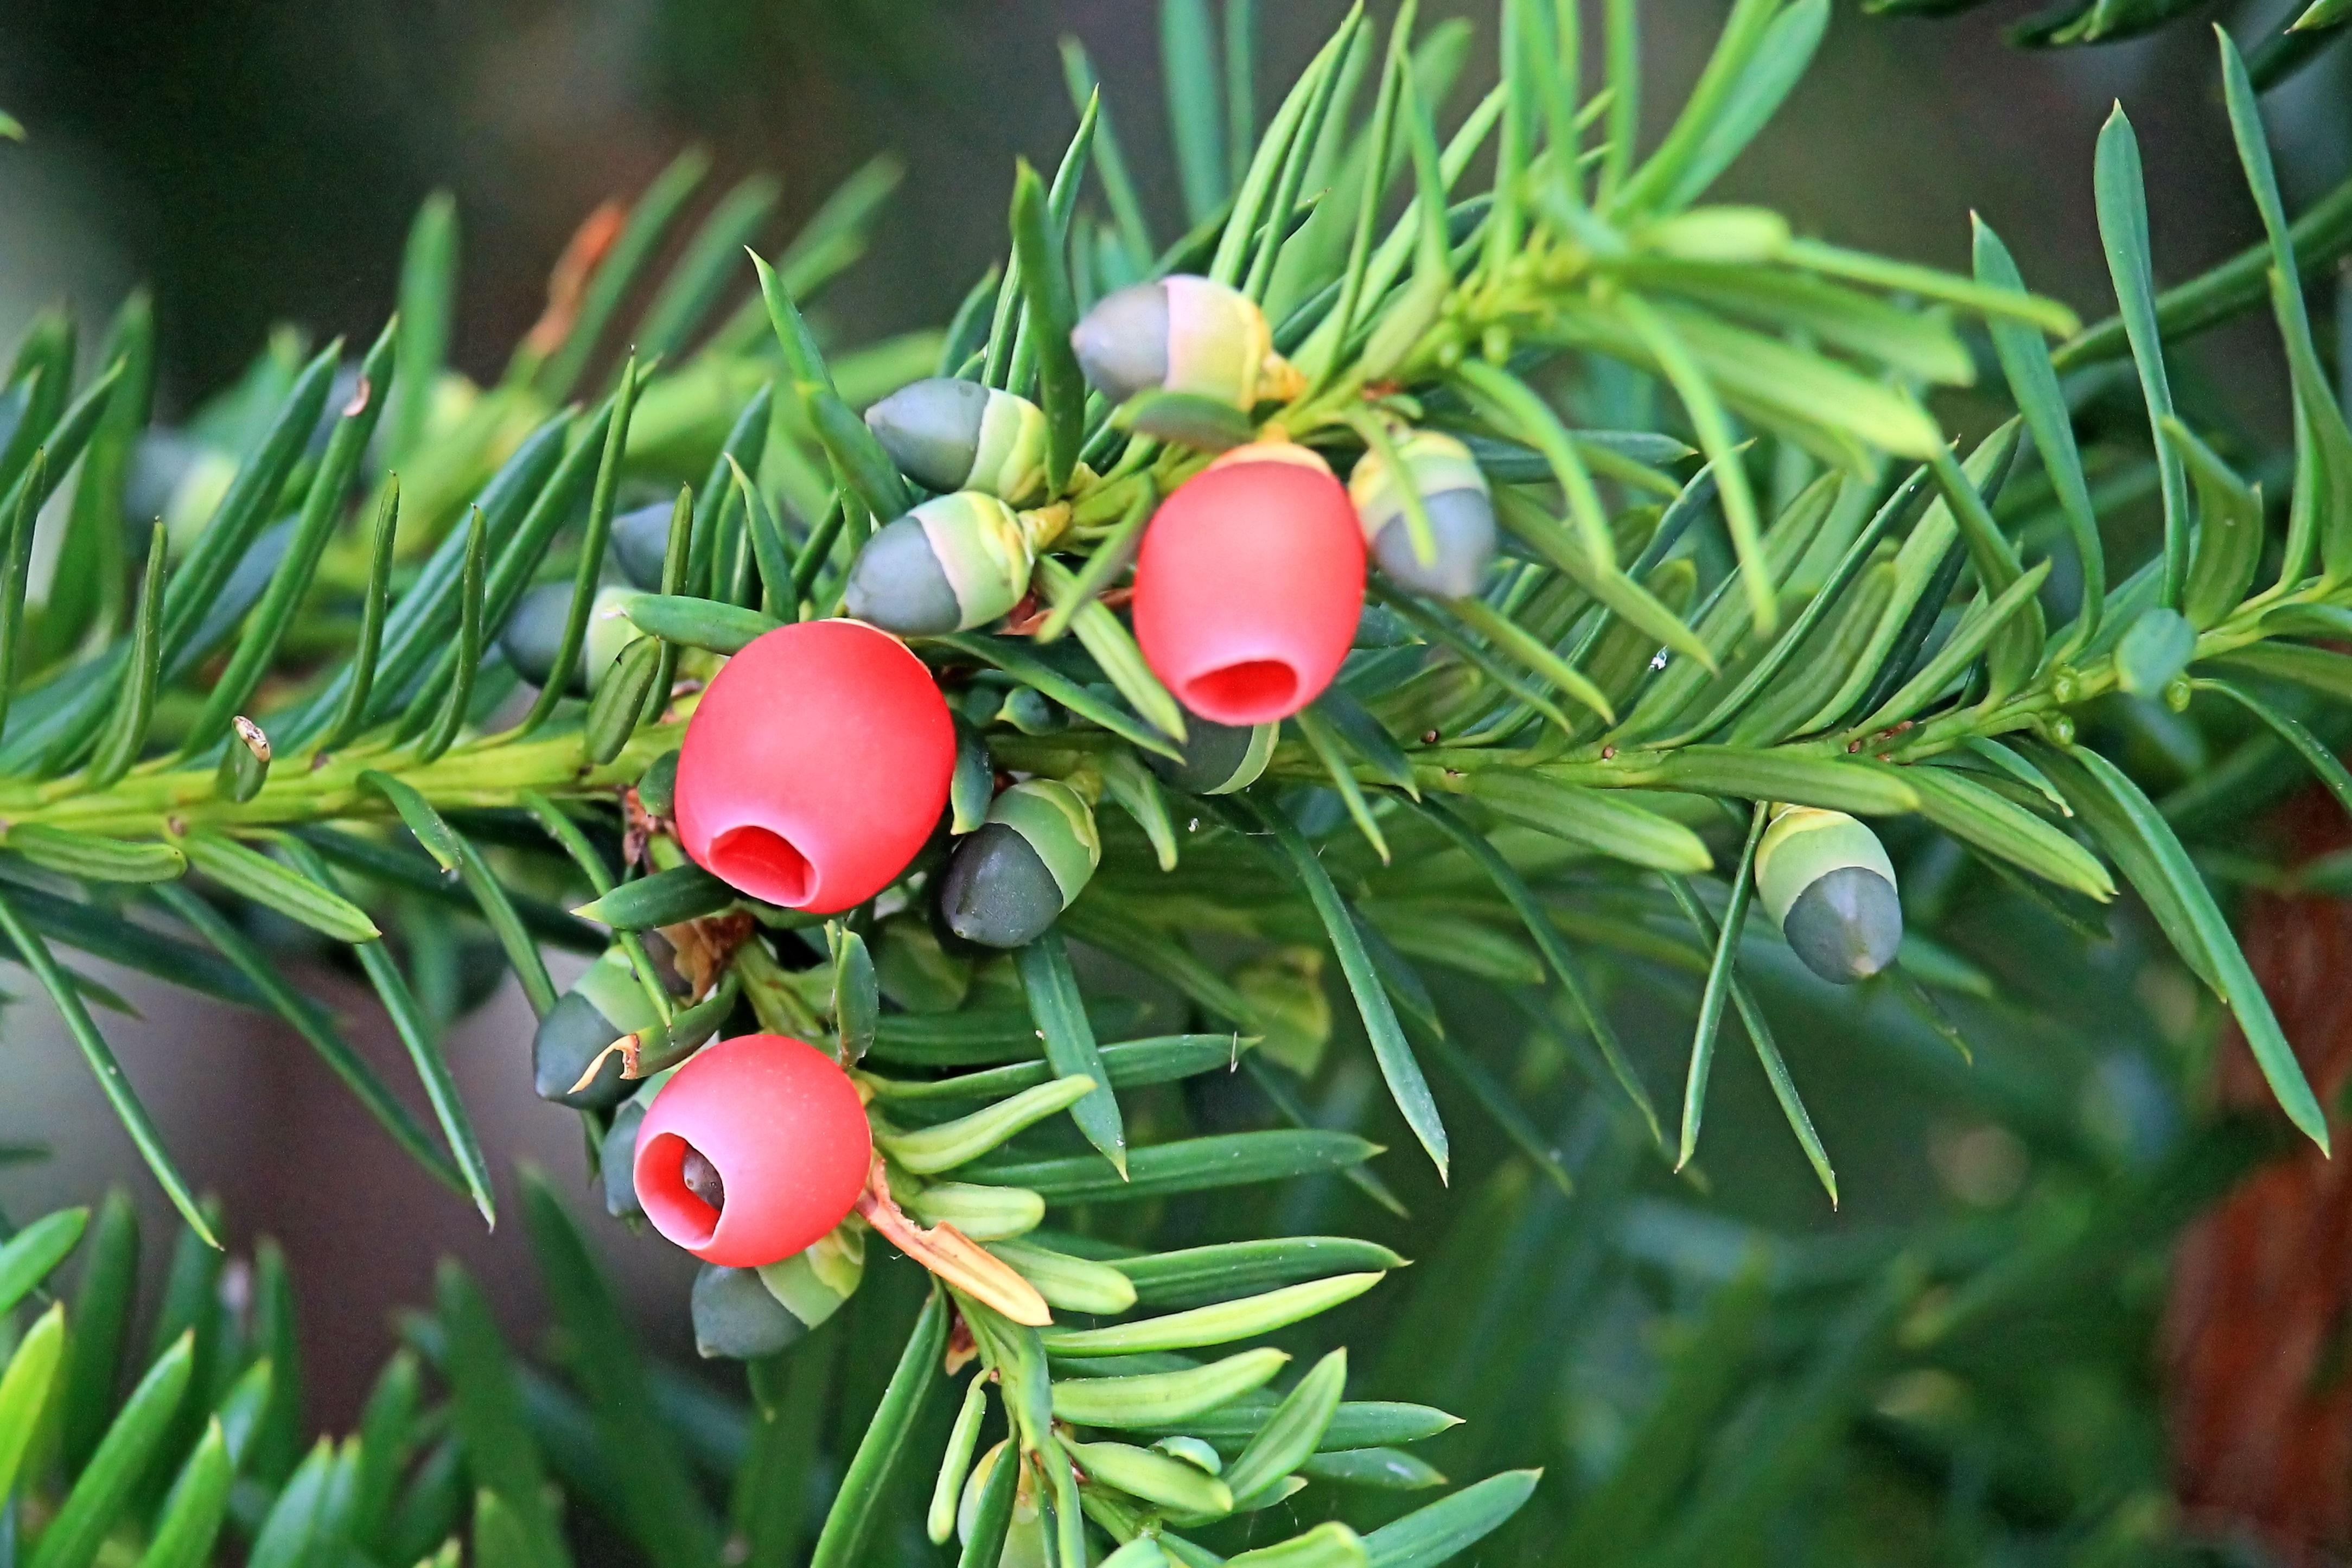 free images tree fruit leaf flower food produce evergreen